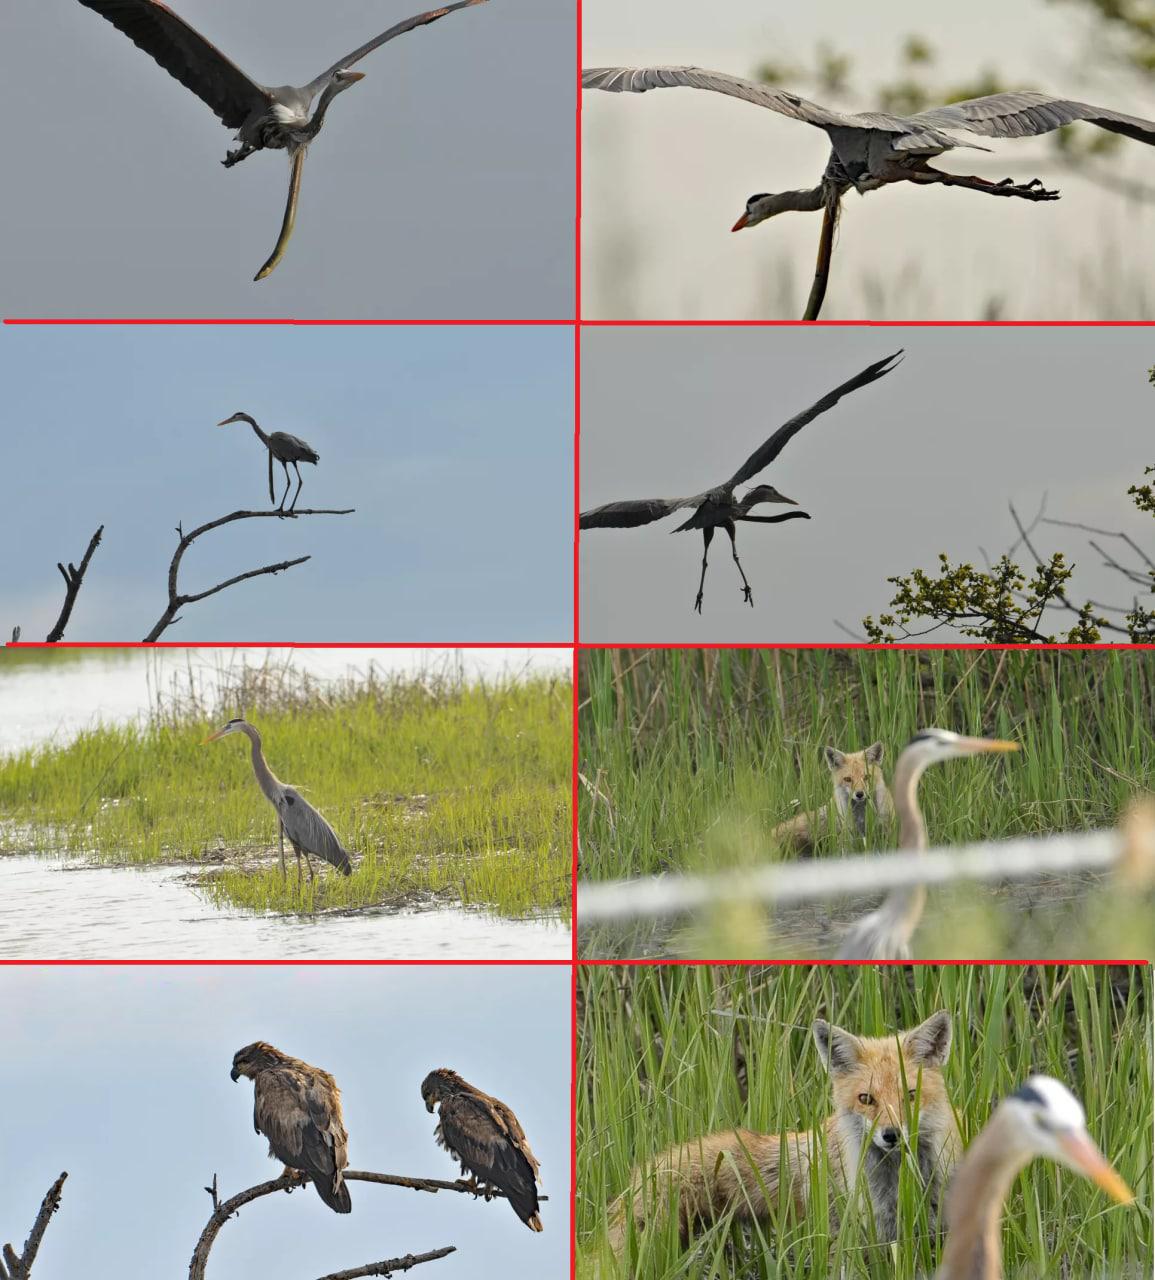 تصاویری باورنکردنی از ضحاک پرنده + عکس